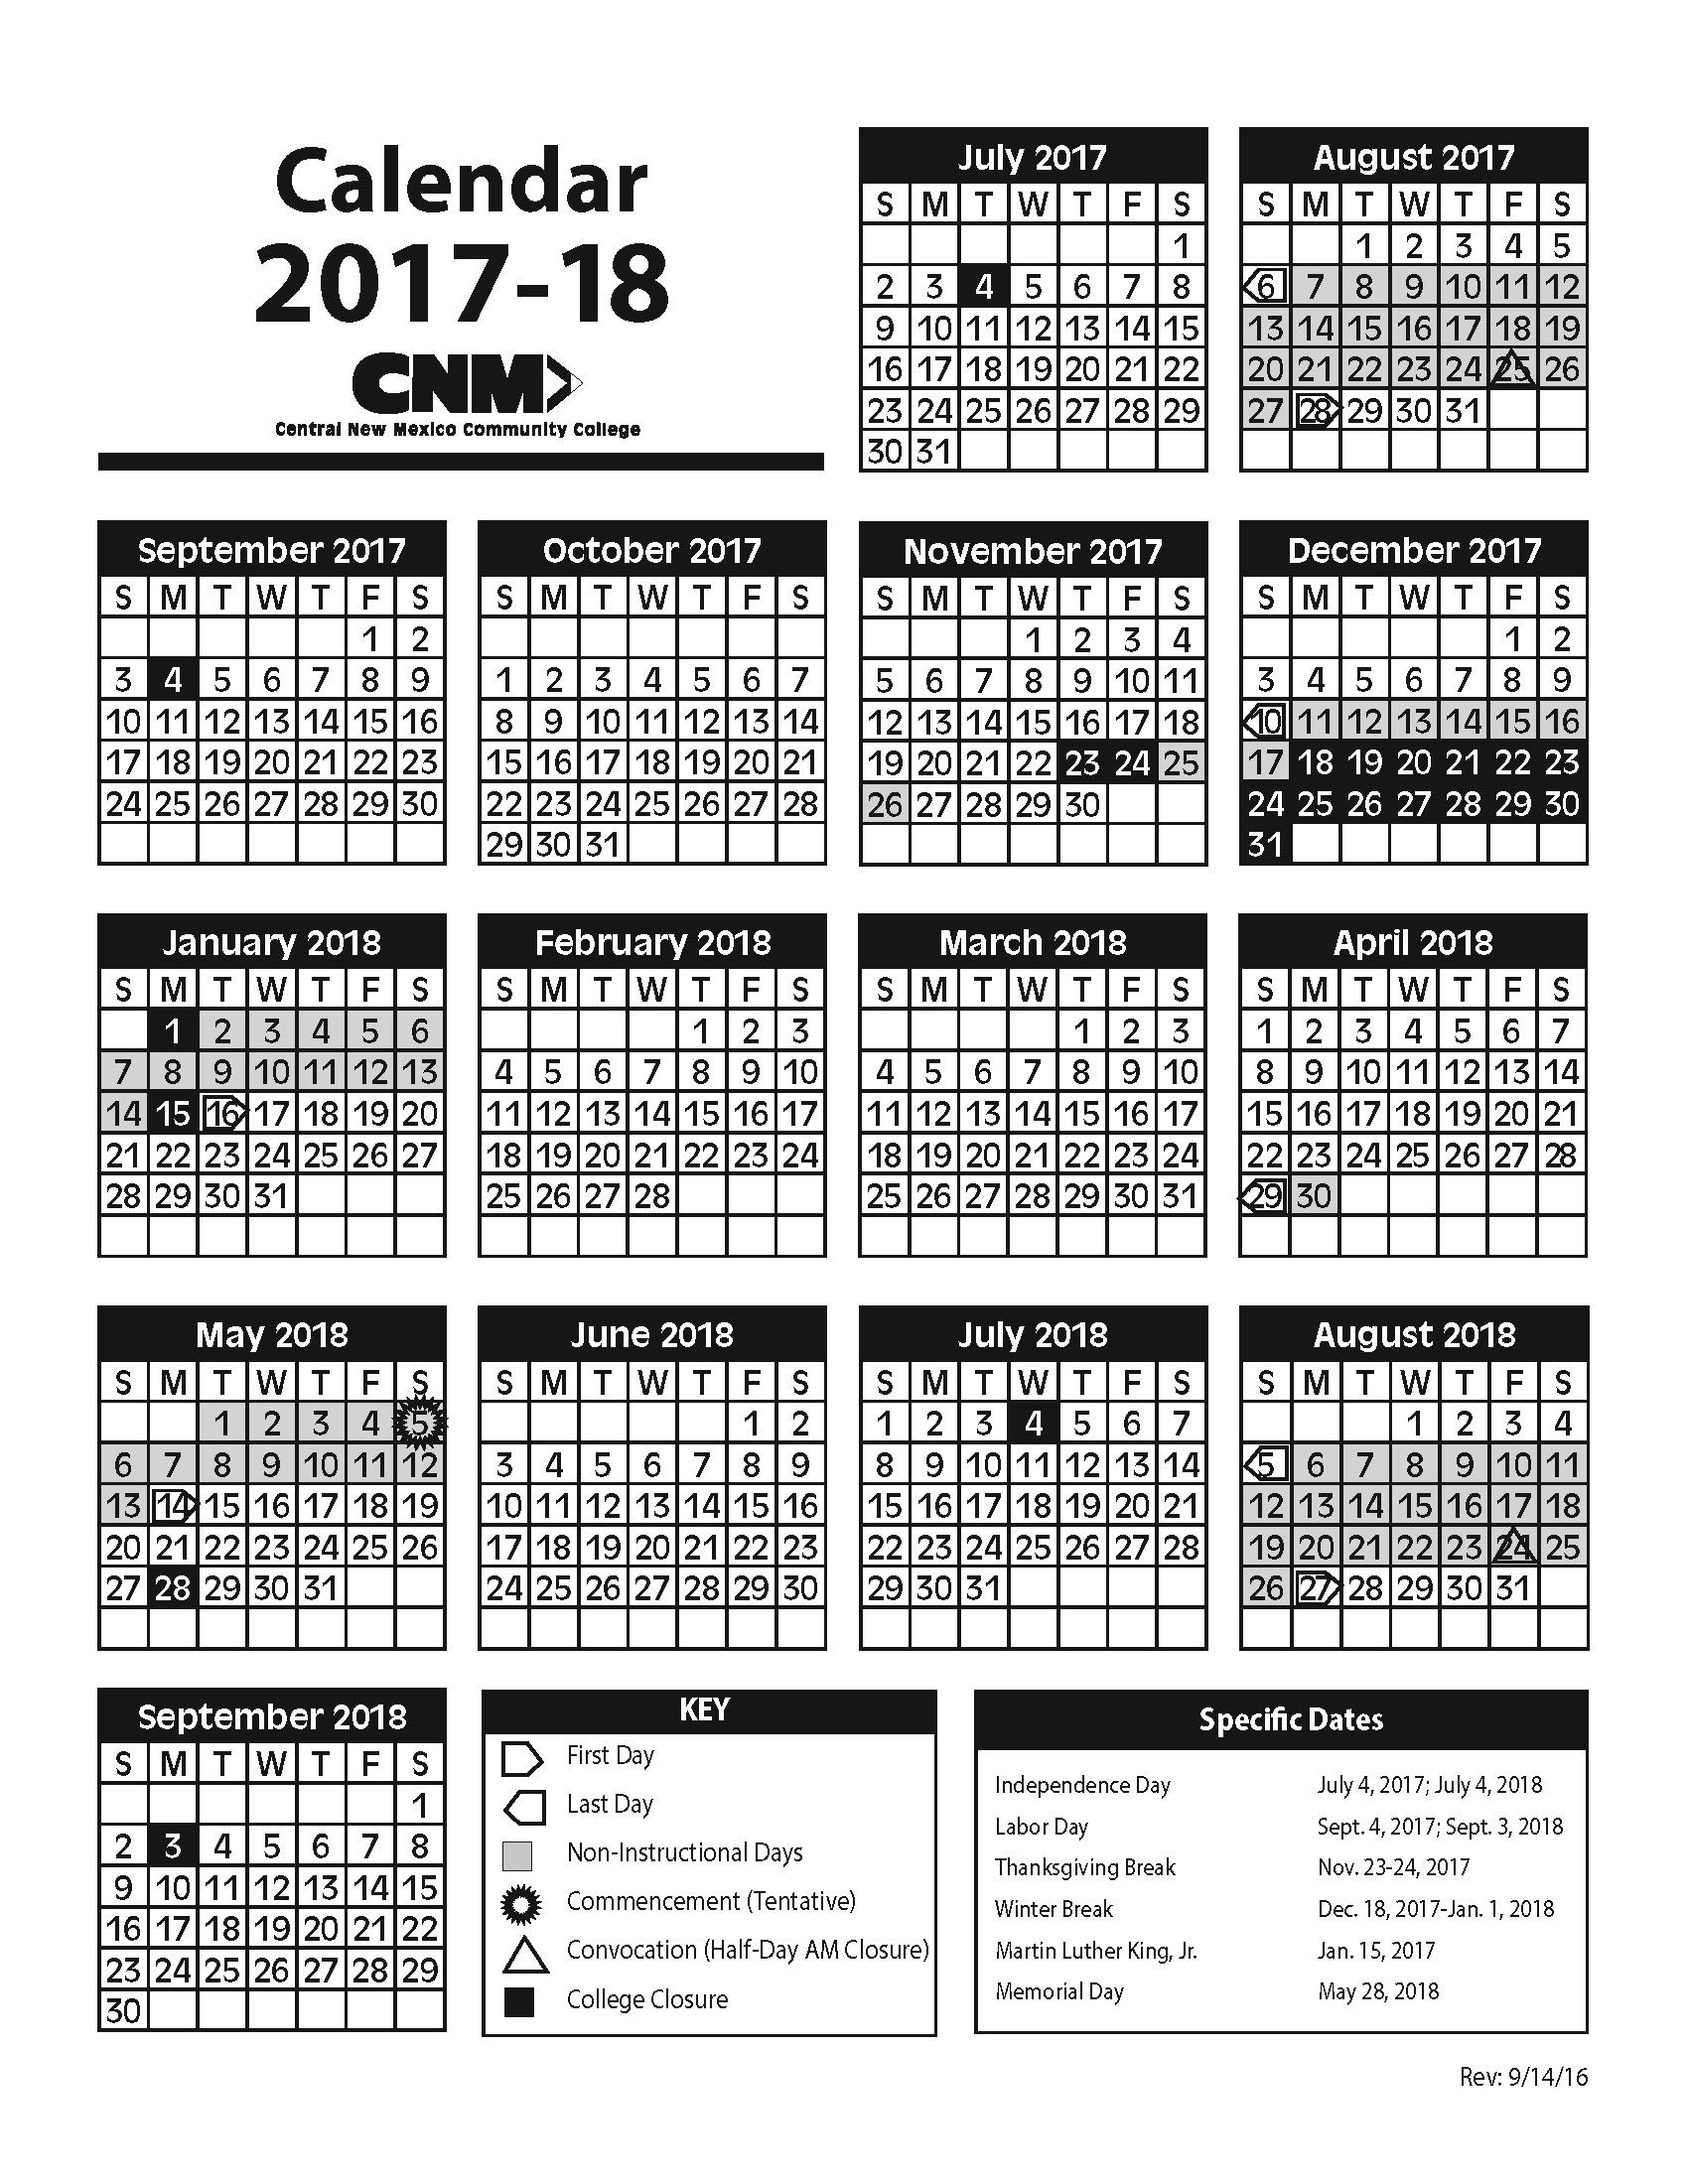 2017 2018 academic calendar image